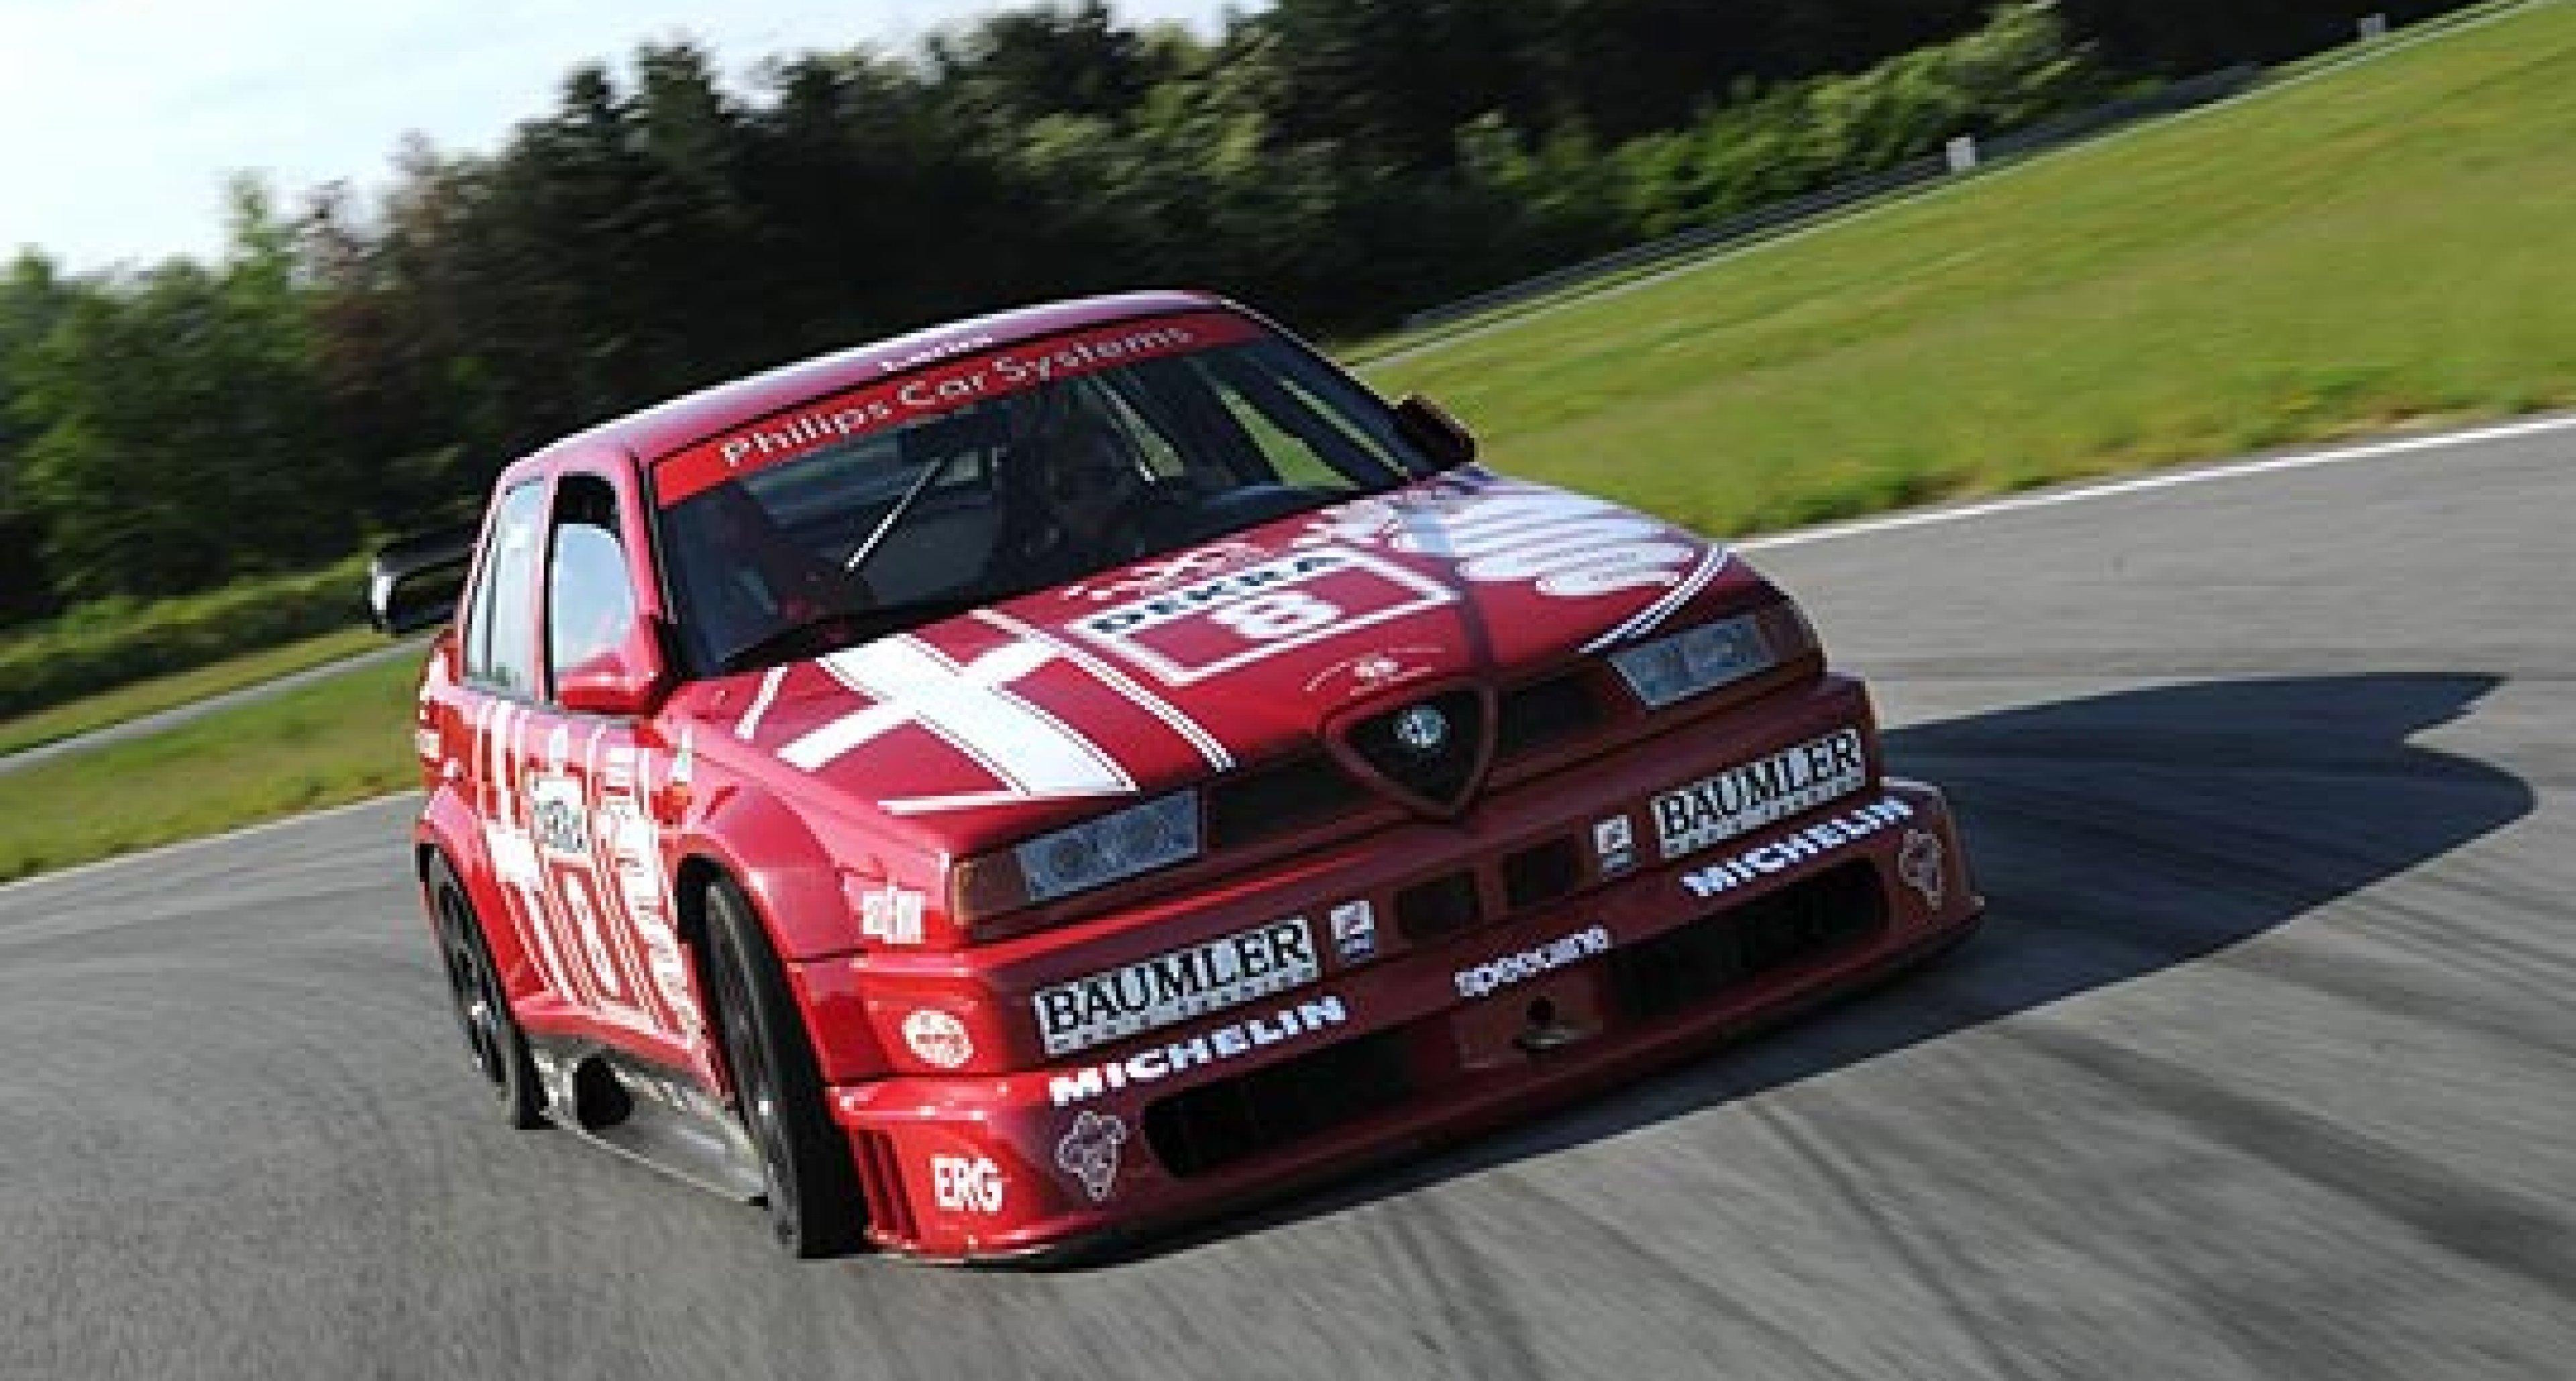 Alfa Romeos: Sampling the Greatest – Part 2